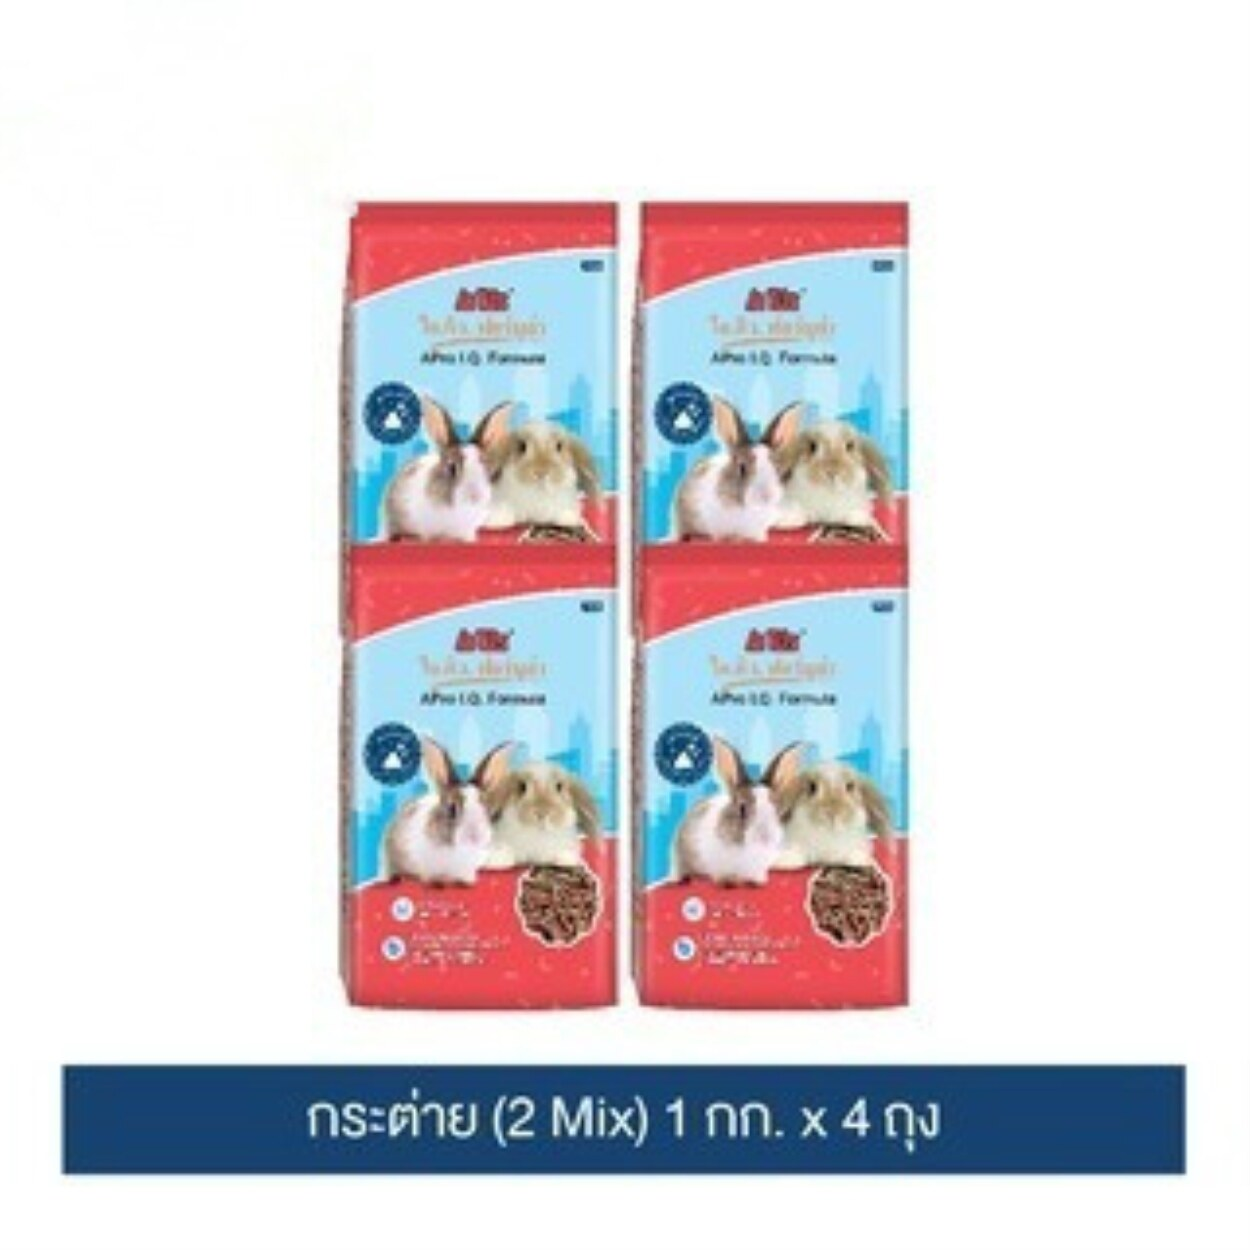 Rabbit food เอโปร ไอคิว ฟอร์มูล่า อาหารกระต่าย (2 Mix) 1กก. (แพ็ค 4) / A Pro I.Q. Formula Rabbit Feed 2 mix 1 kg. (Pack 4)